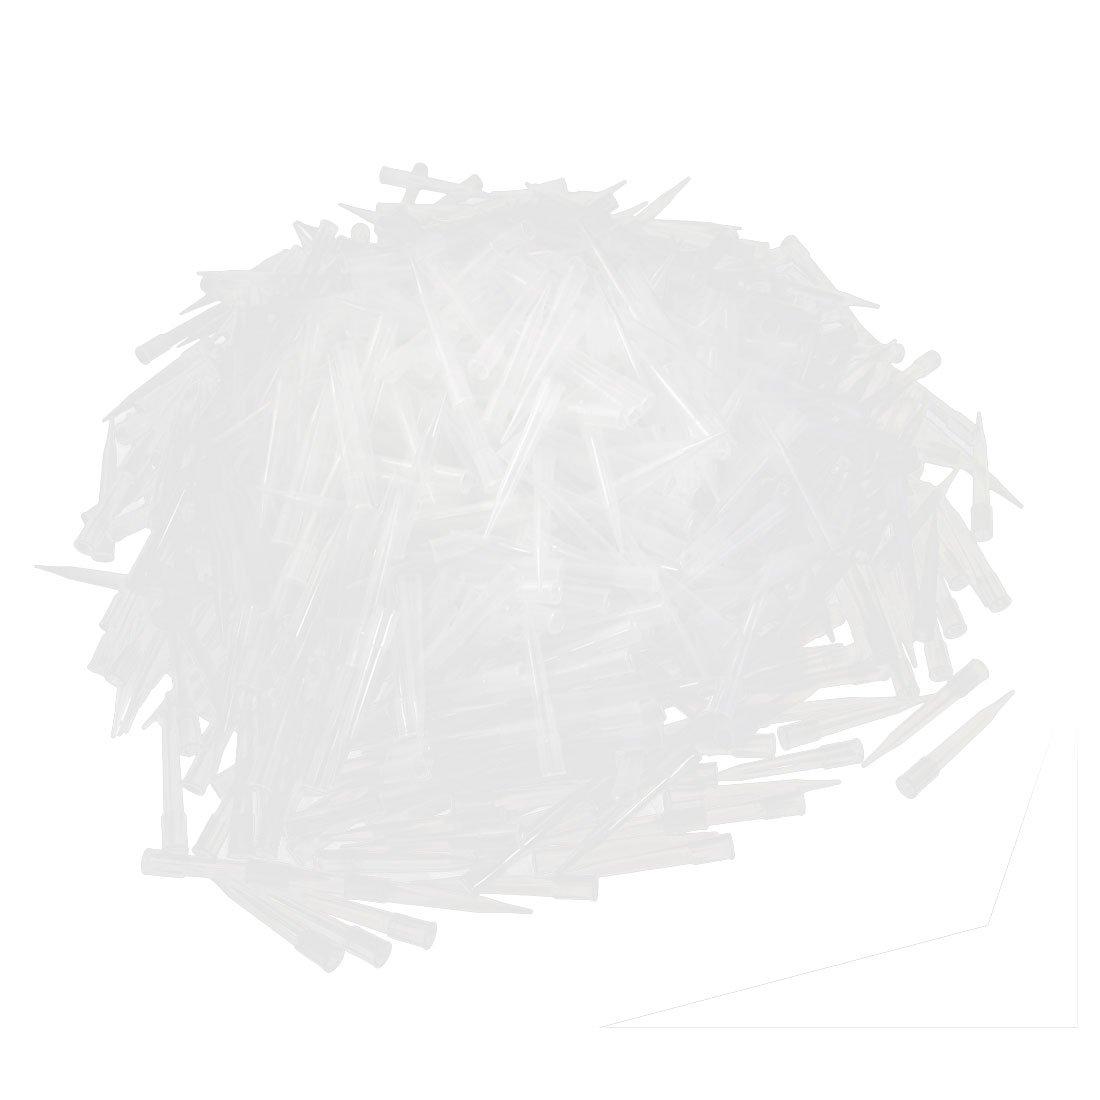 uxcell Laboratory Clear Plastic 300UL Liquid Pipette Pipettor Tips 1000 Pcs